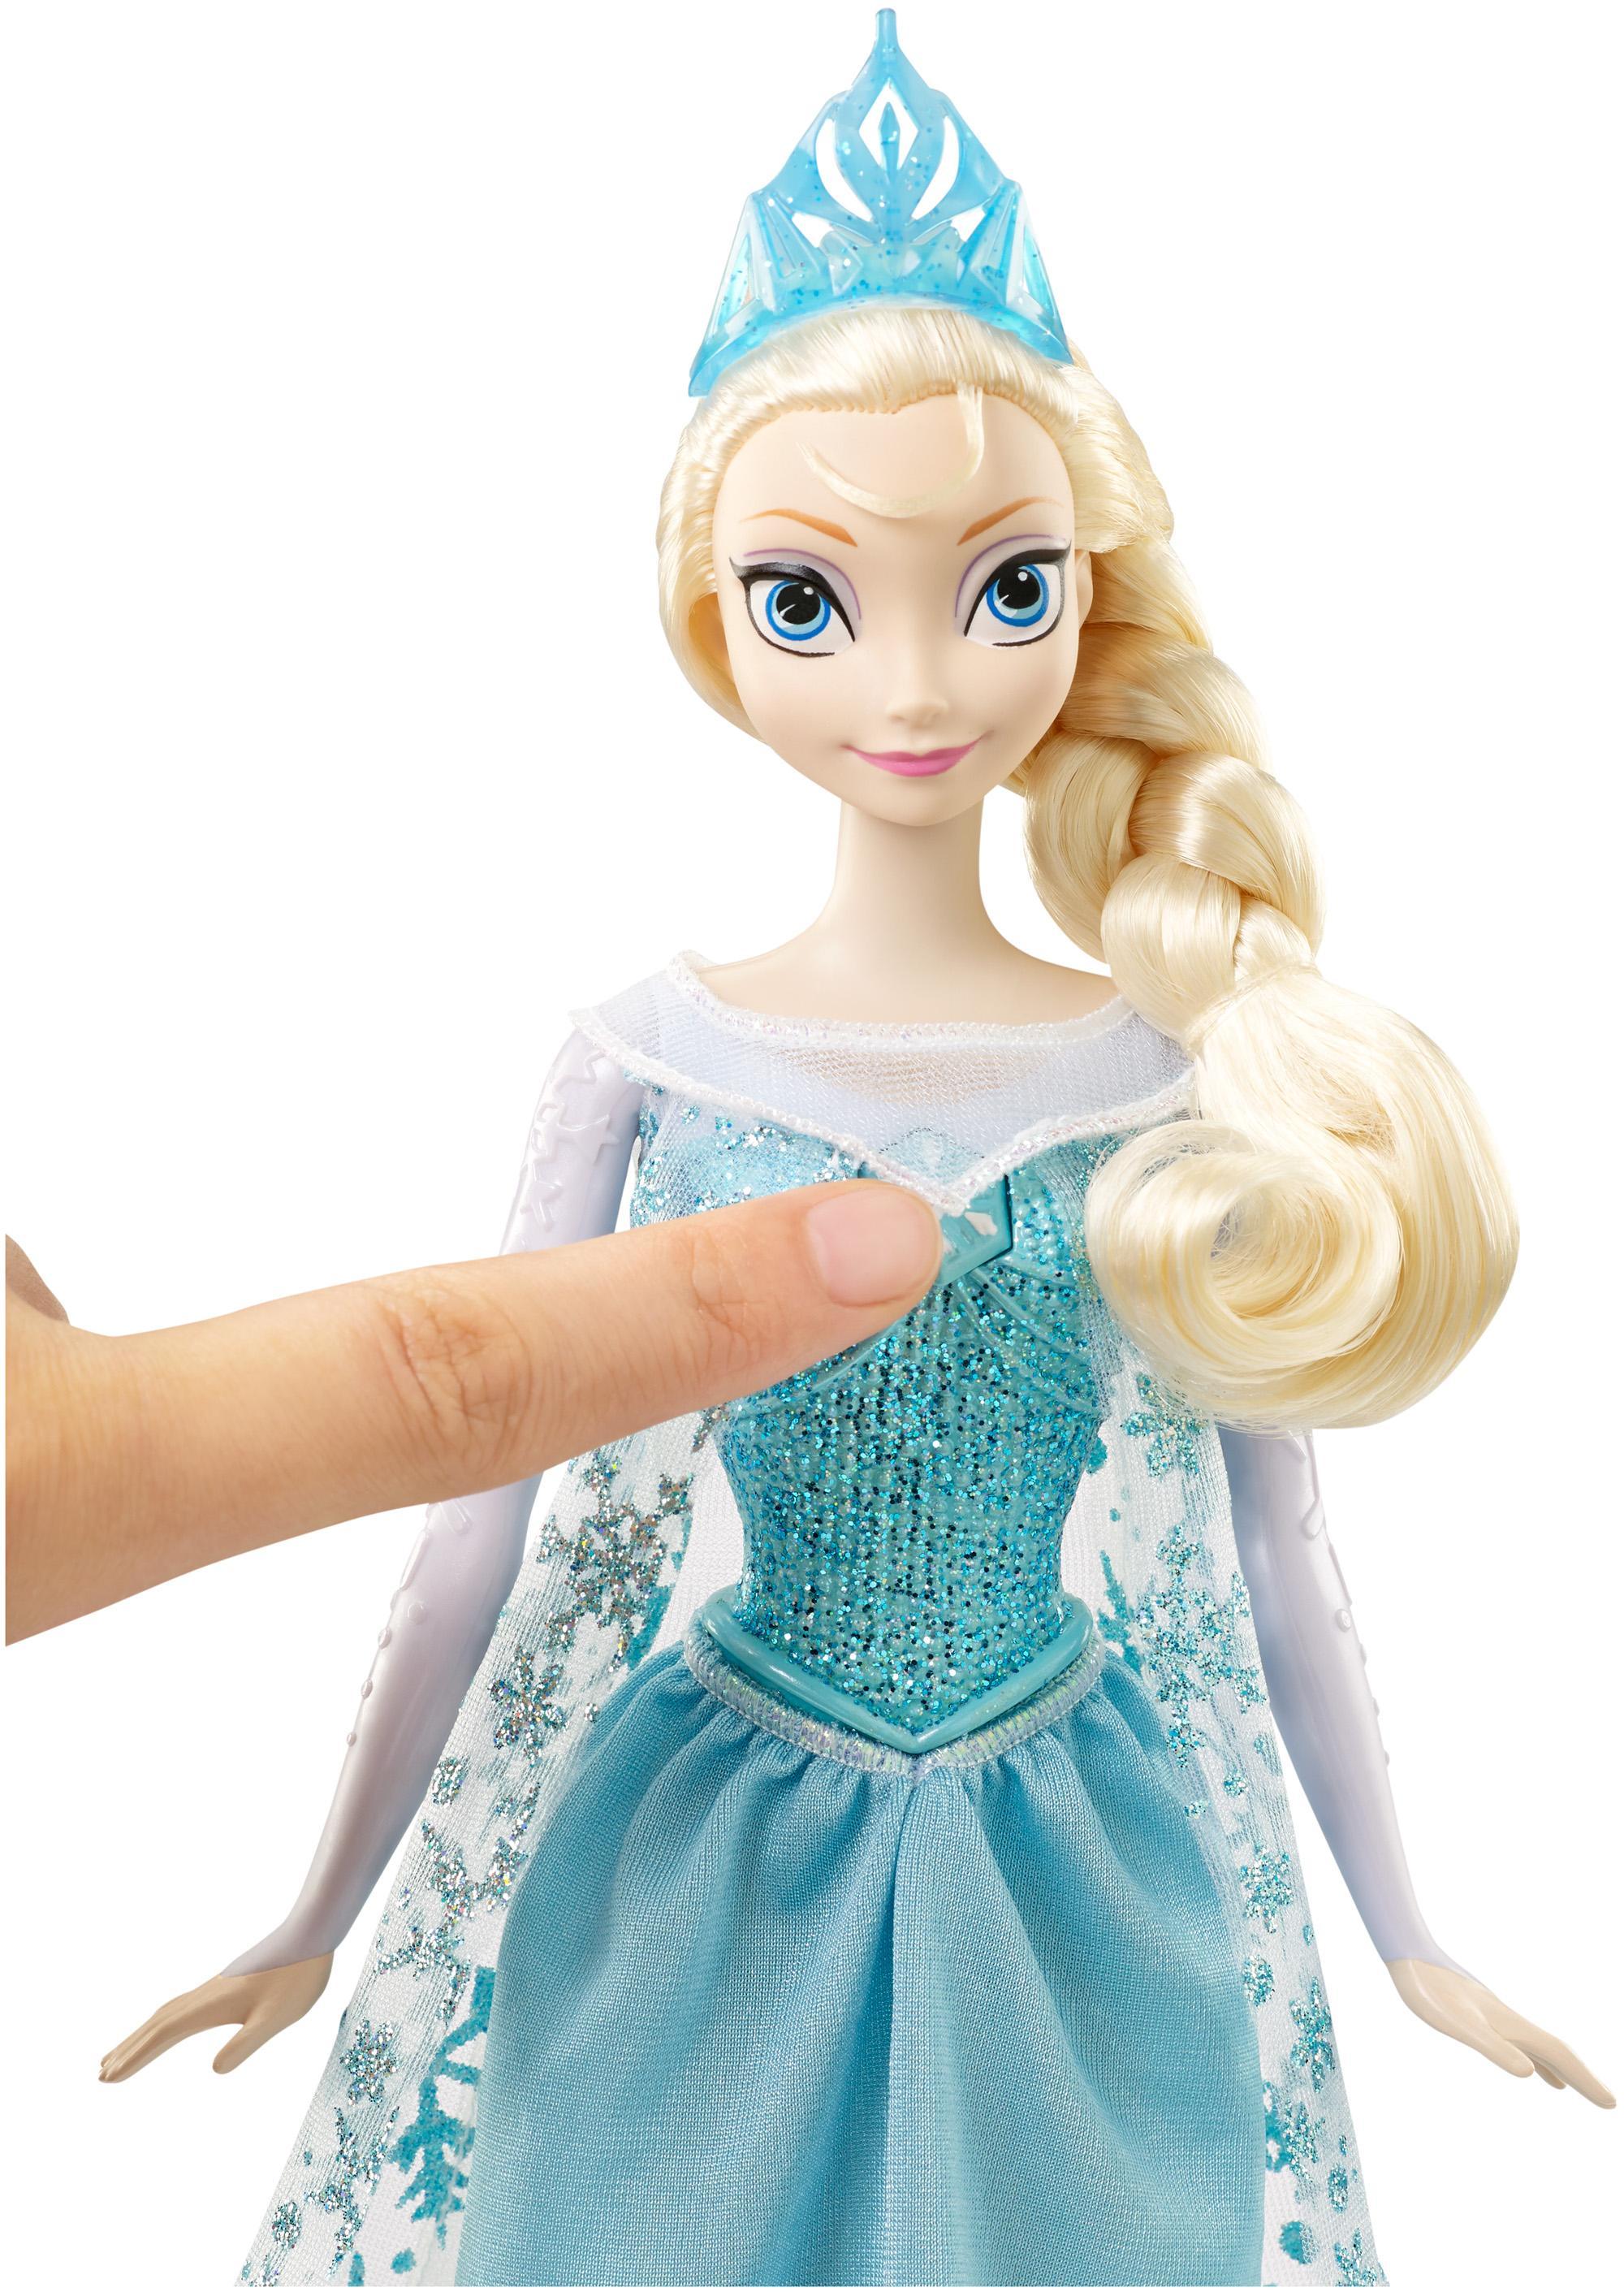 Dolls & Bears Hard-Working Disney Princess 50 Cm Anna Frozen Plush Cuddly Toy Girls New No Tags Elsa Film C